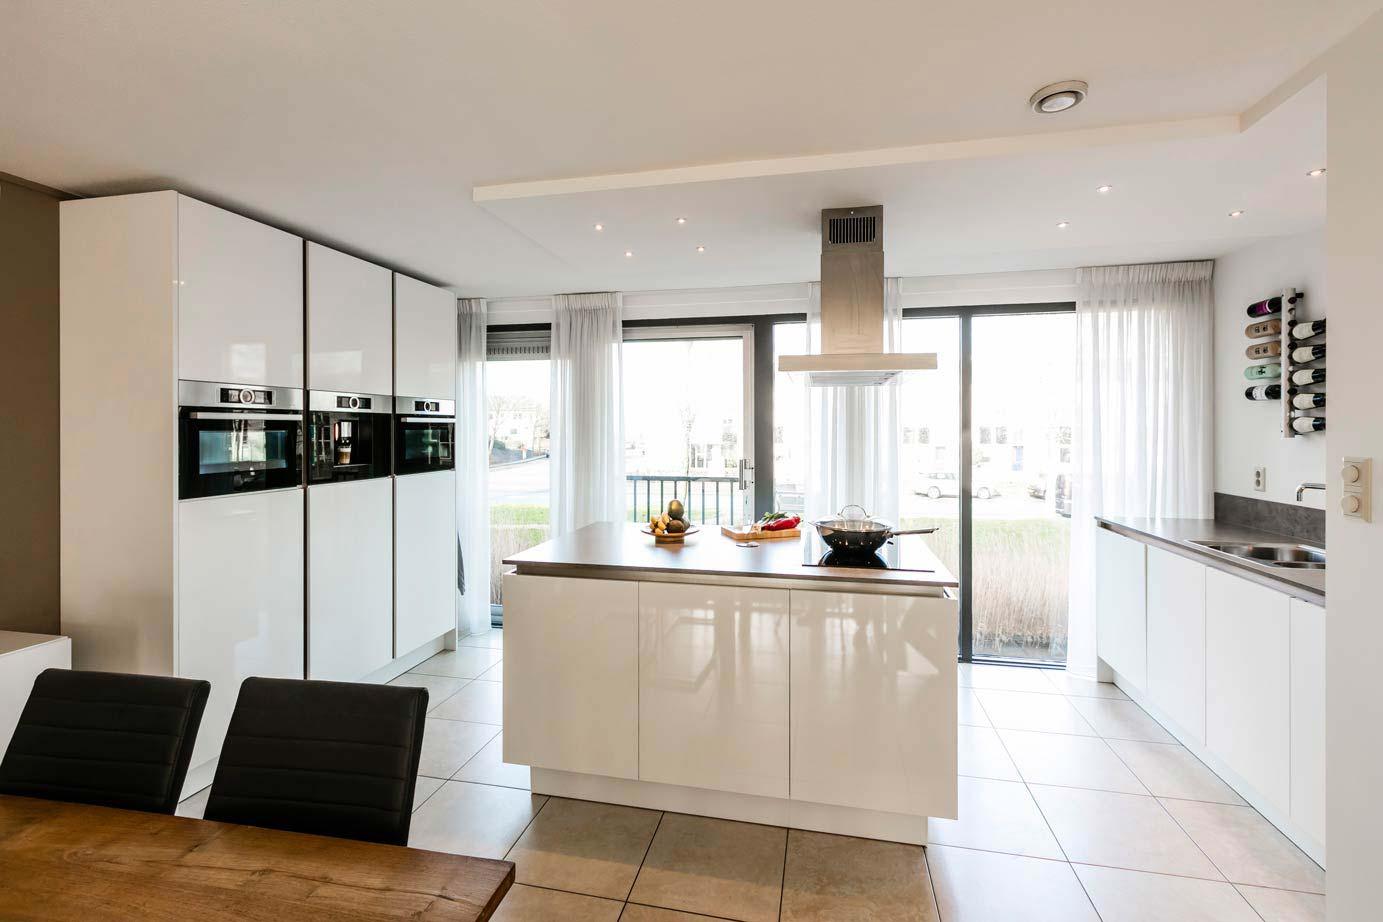 Moderne Keukens Wit : Iedere keukenstijl beschikbaar onder één dak adee